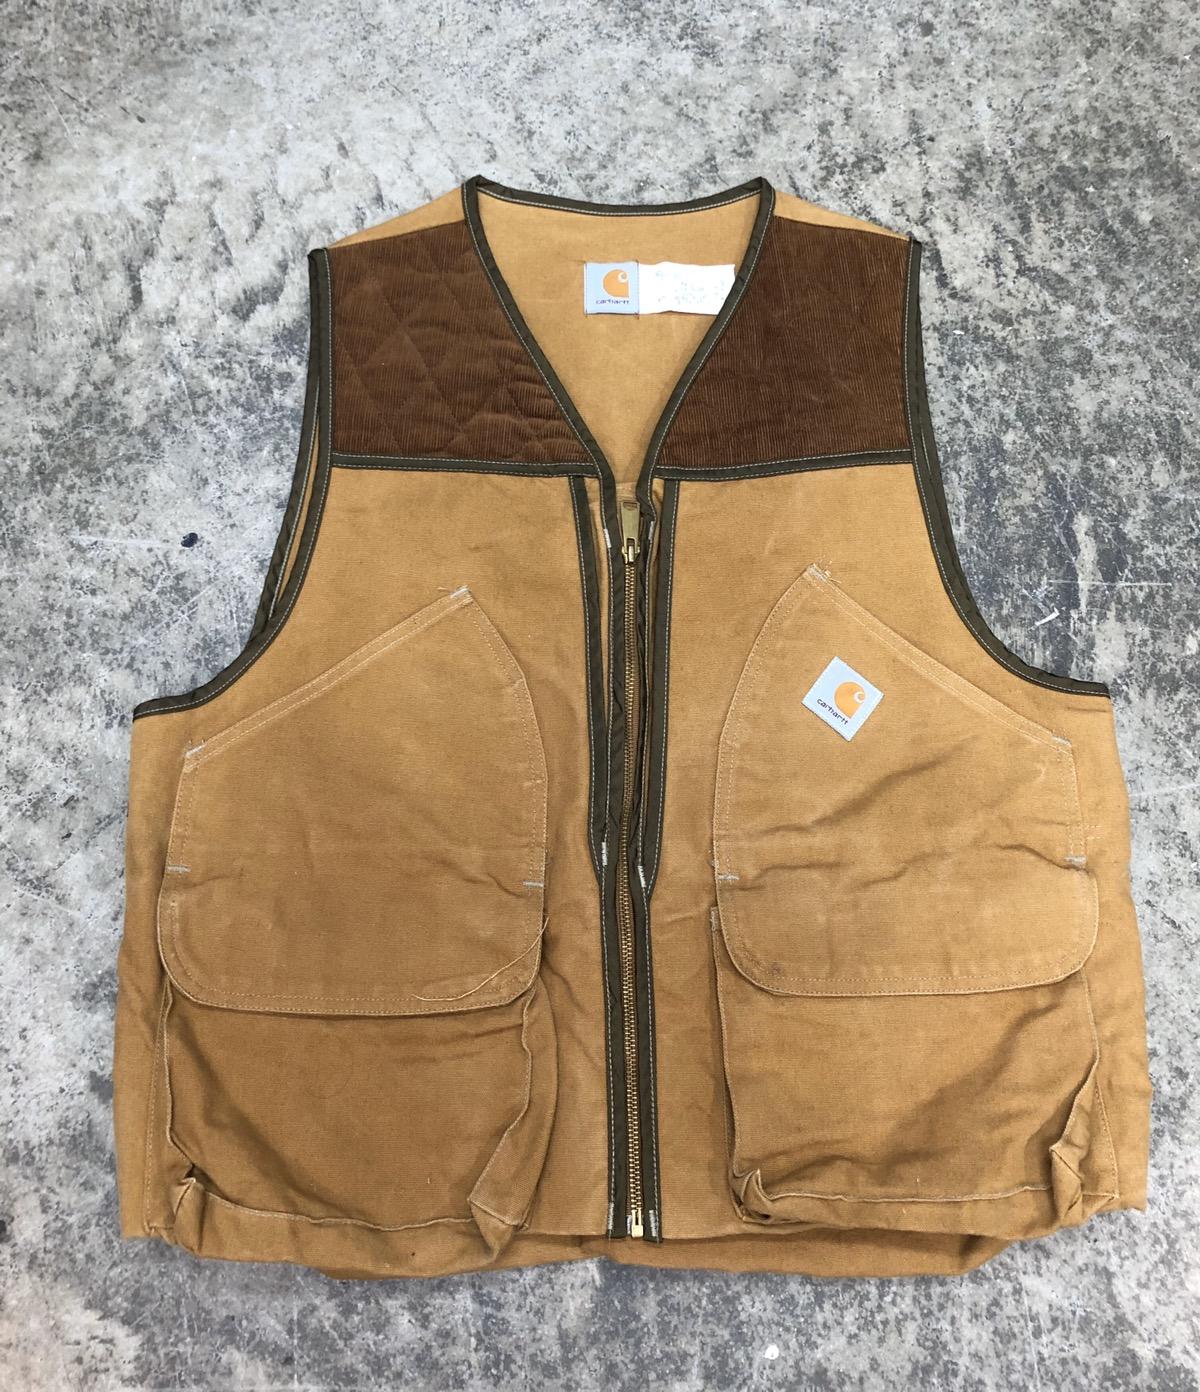 Vintage Unique Vintage 90s Carhartt Hunting Vest Grailed